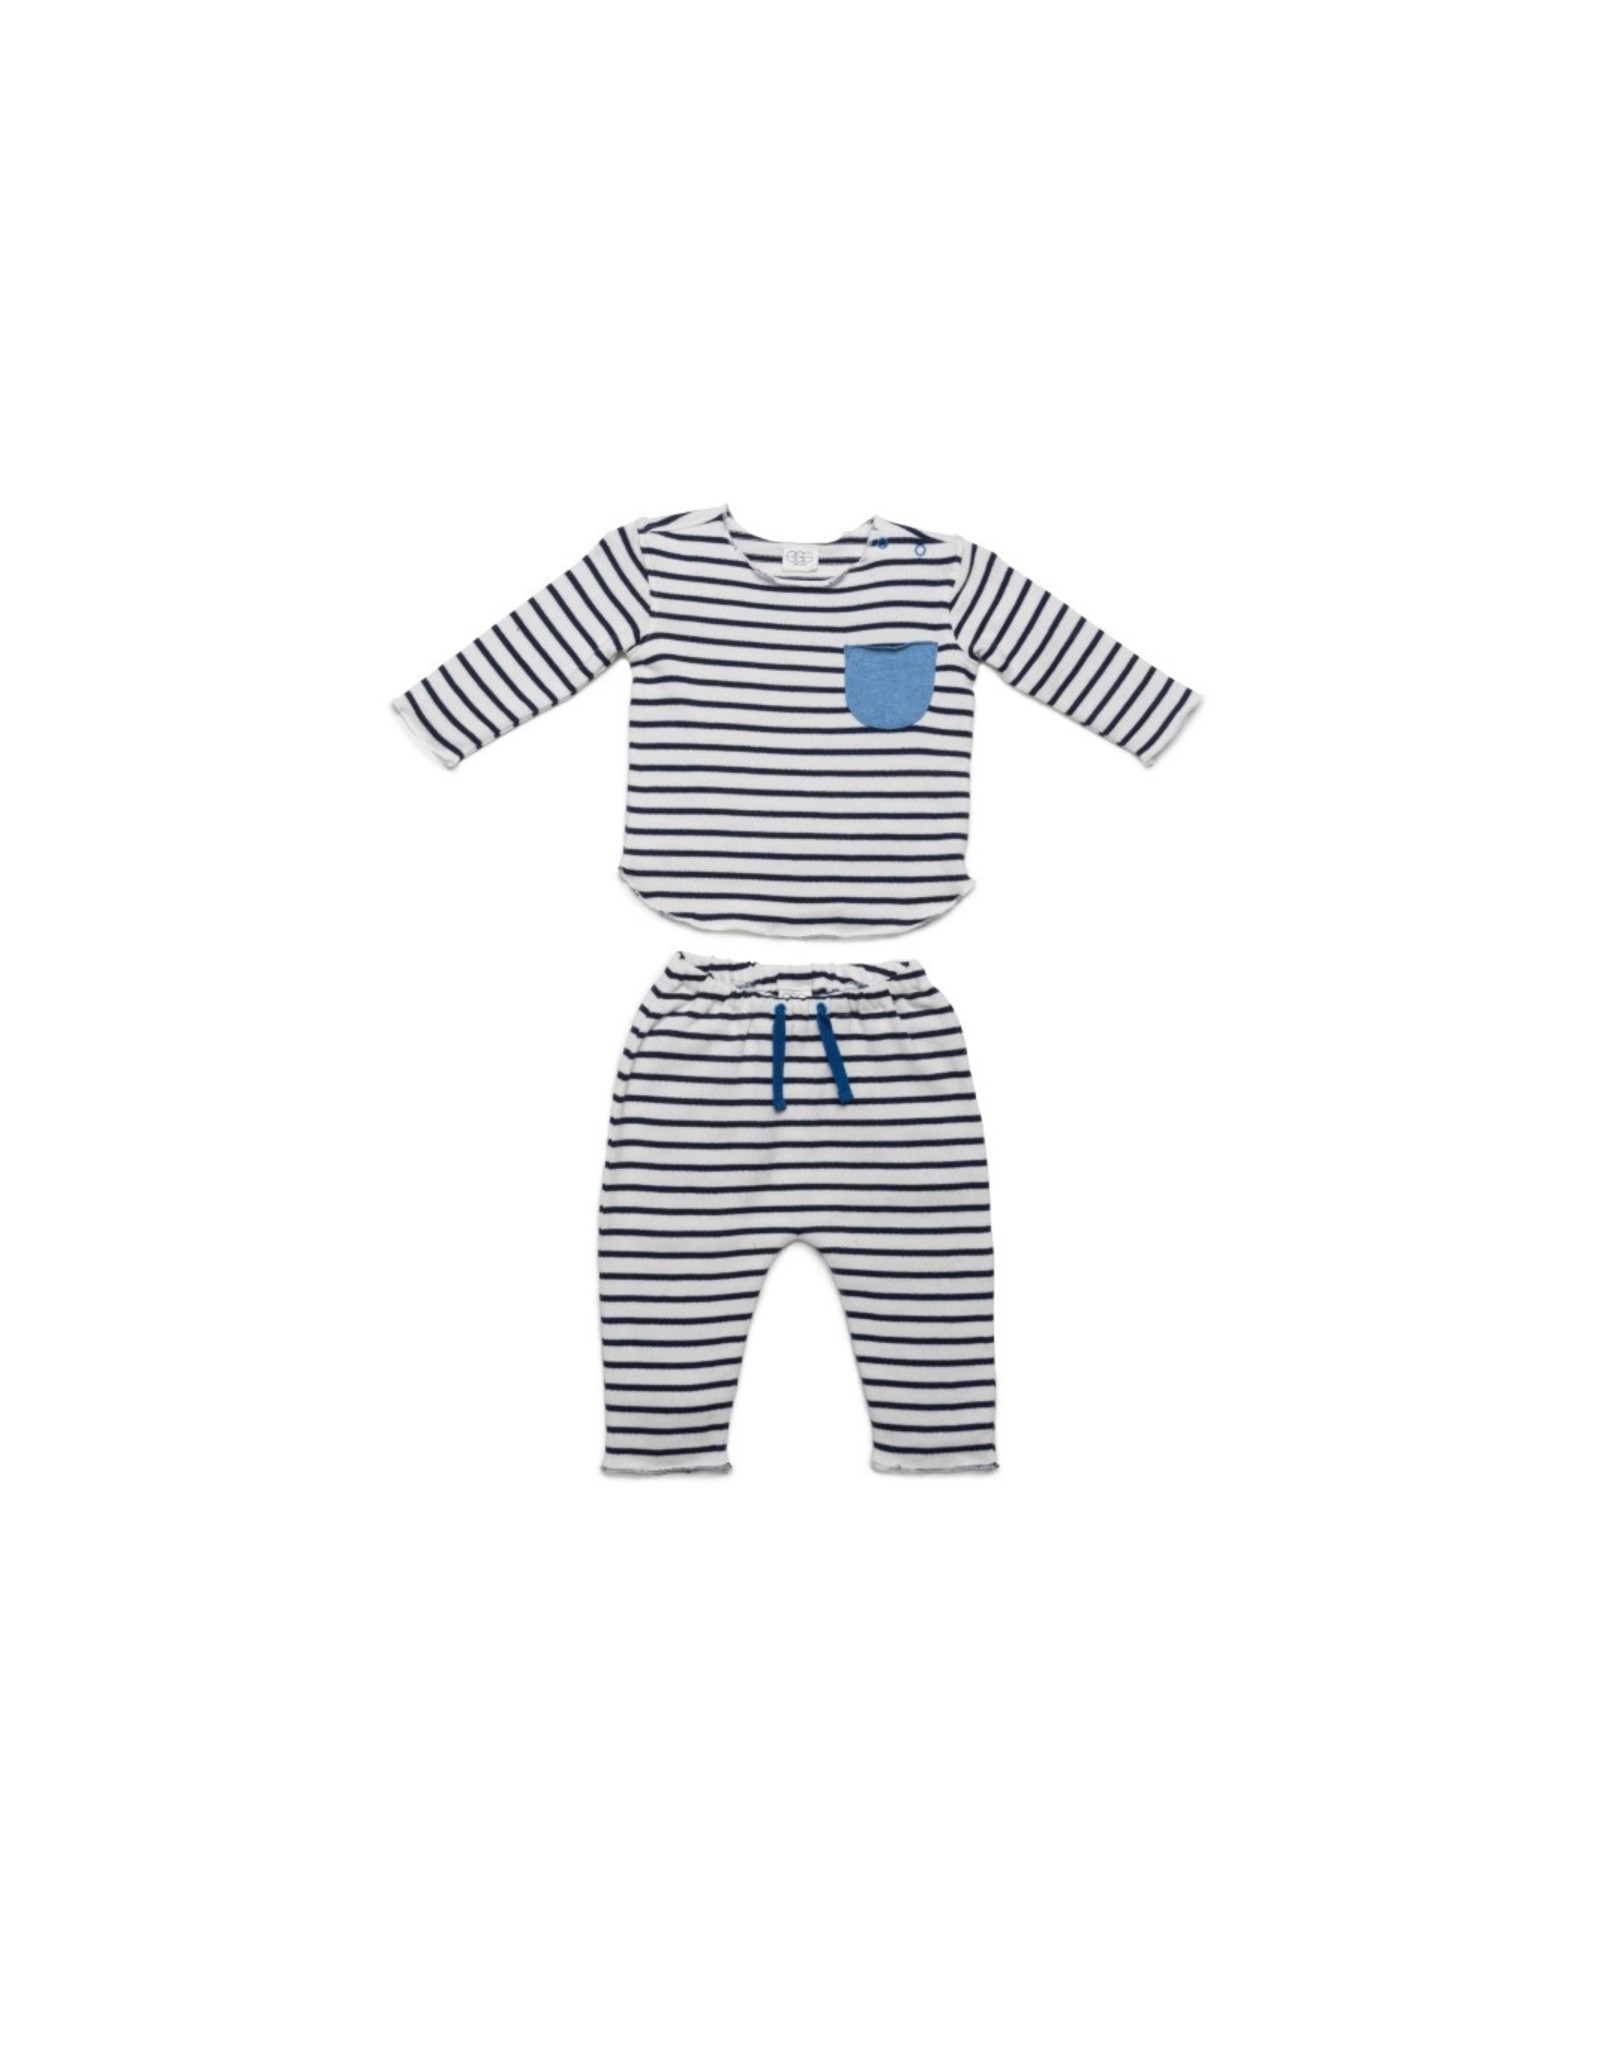 EGG EGG Bobbi Knit Set Blue Stripe